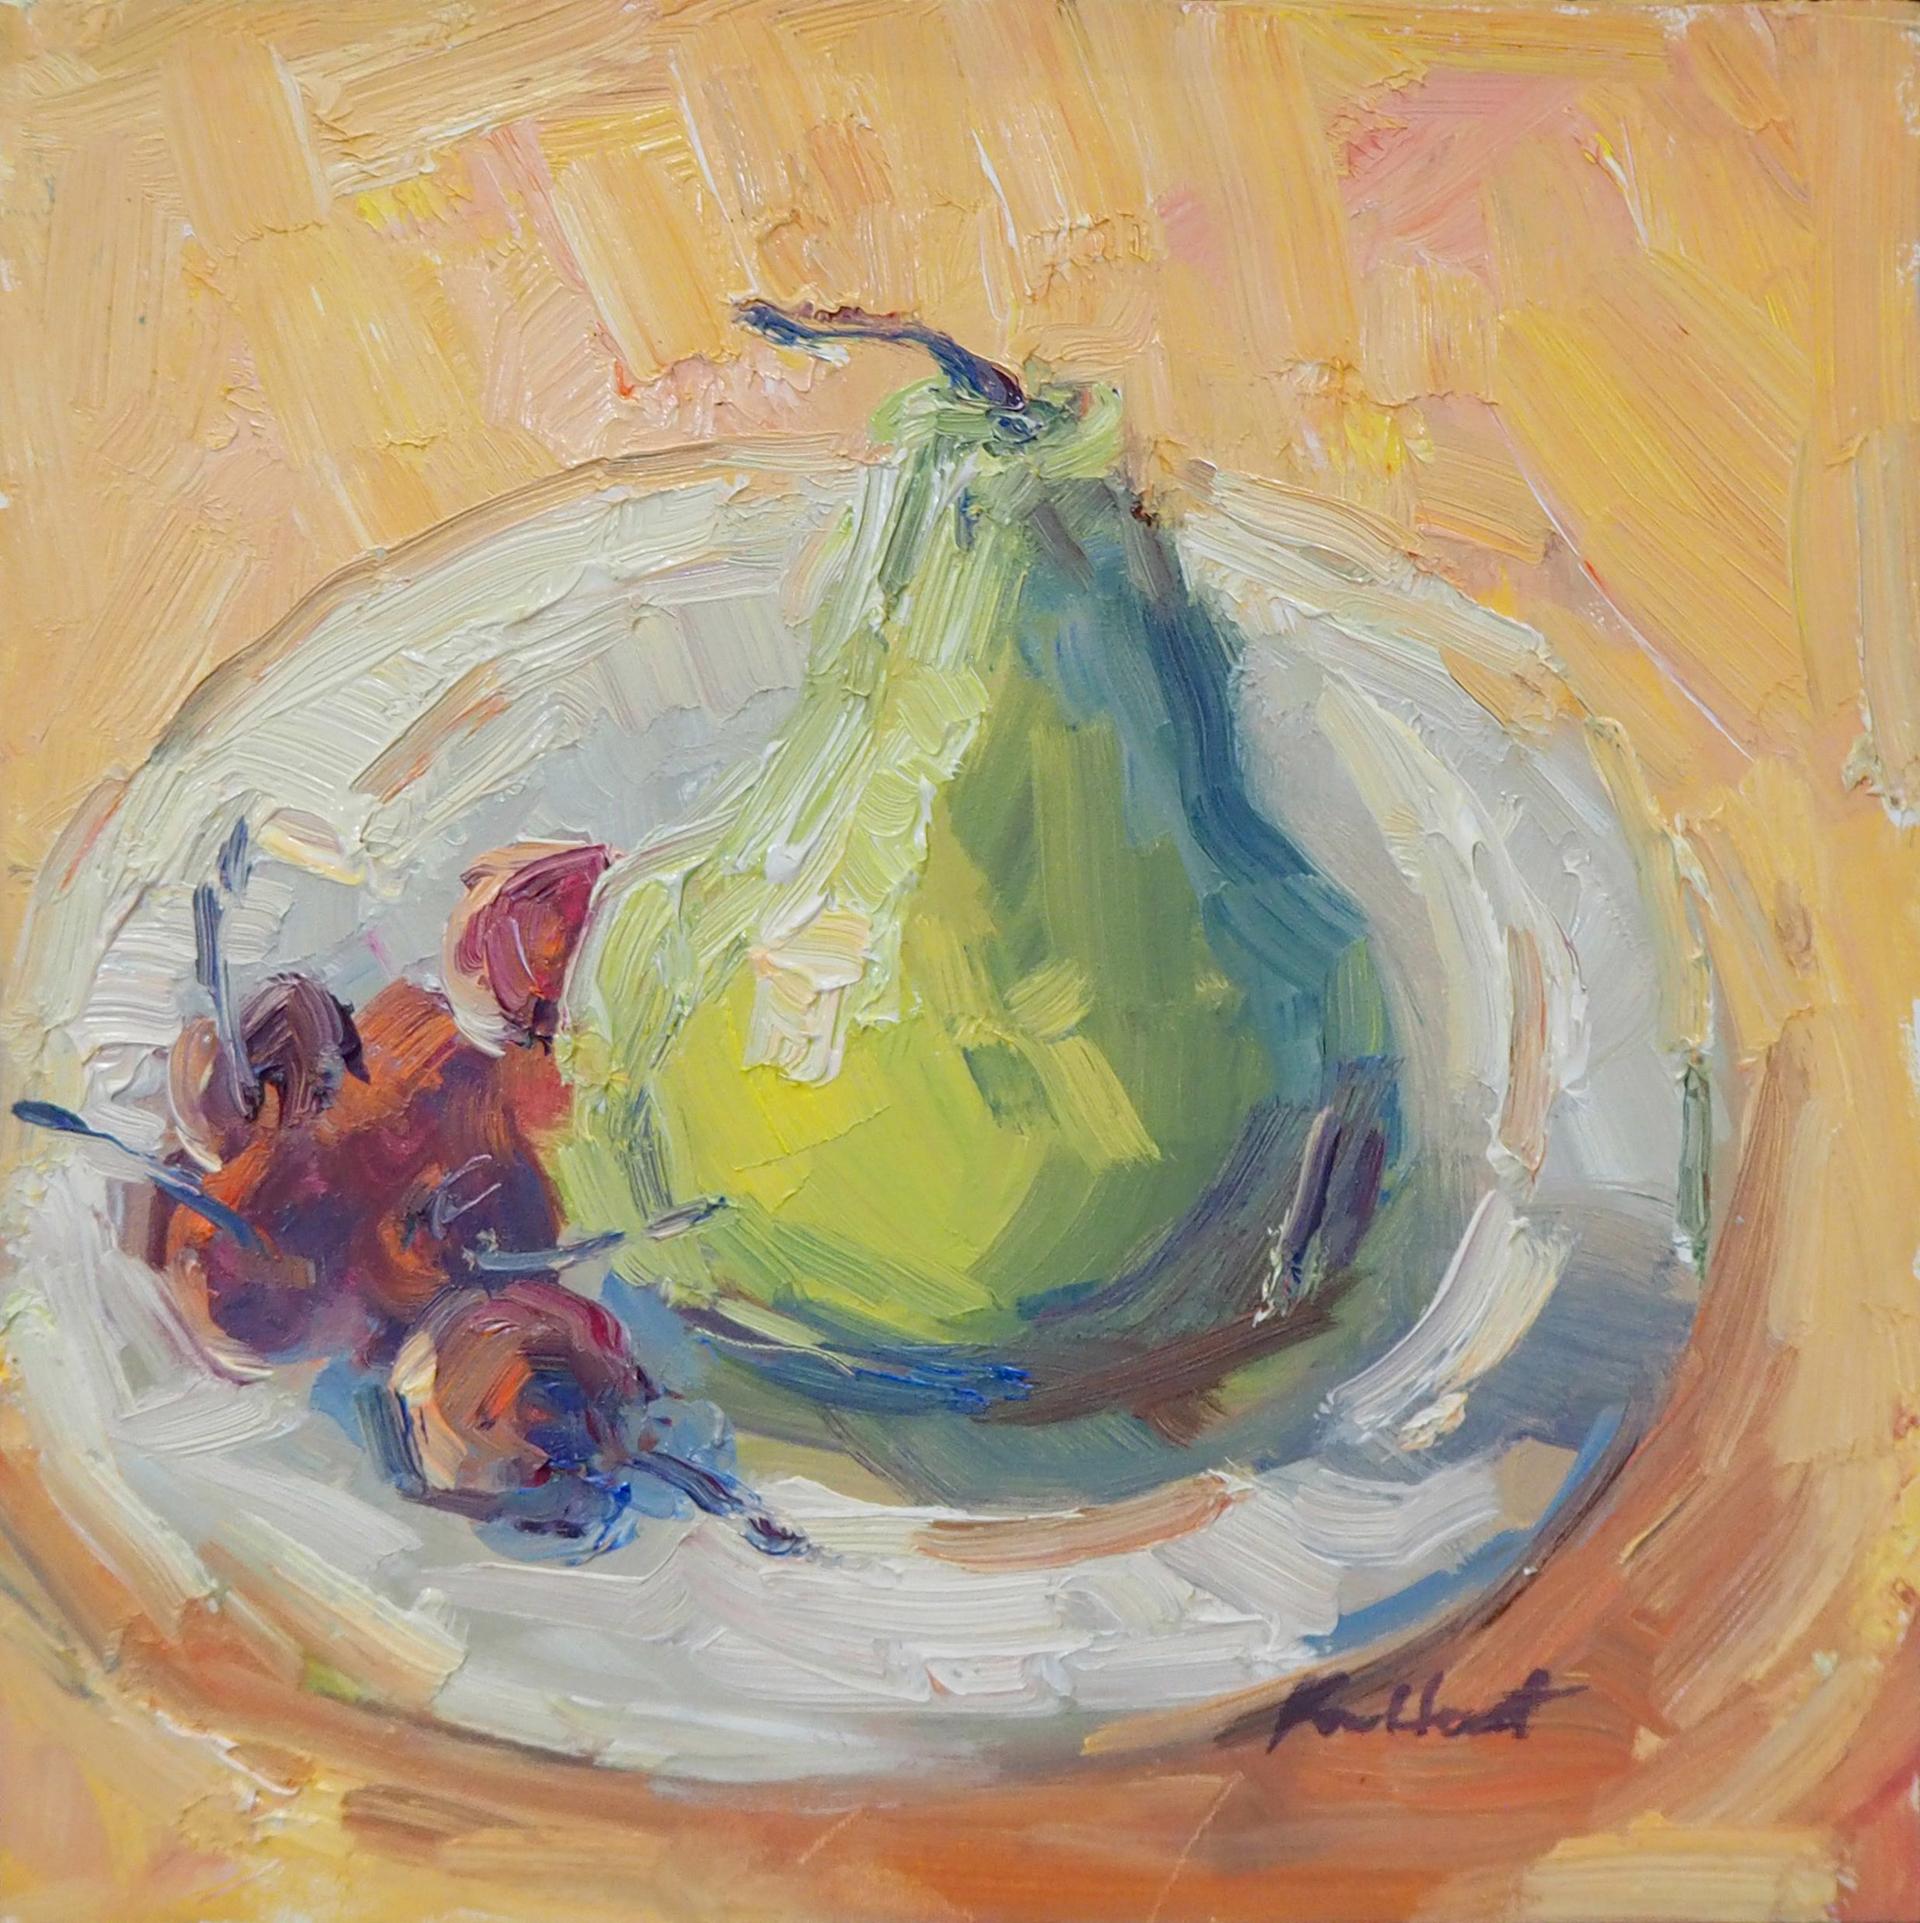 Pear & Cherries in Italy by Karen Hewitt Hagan